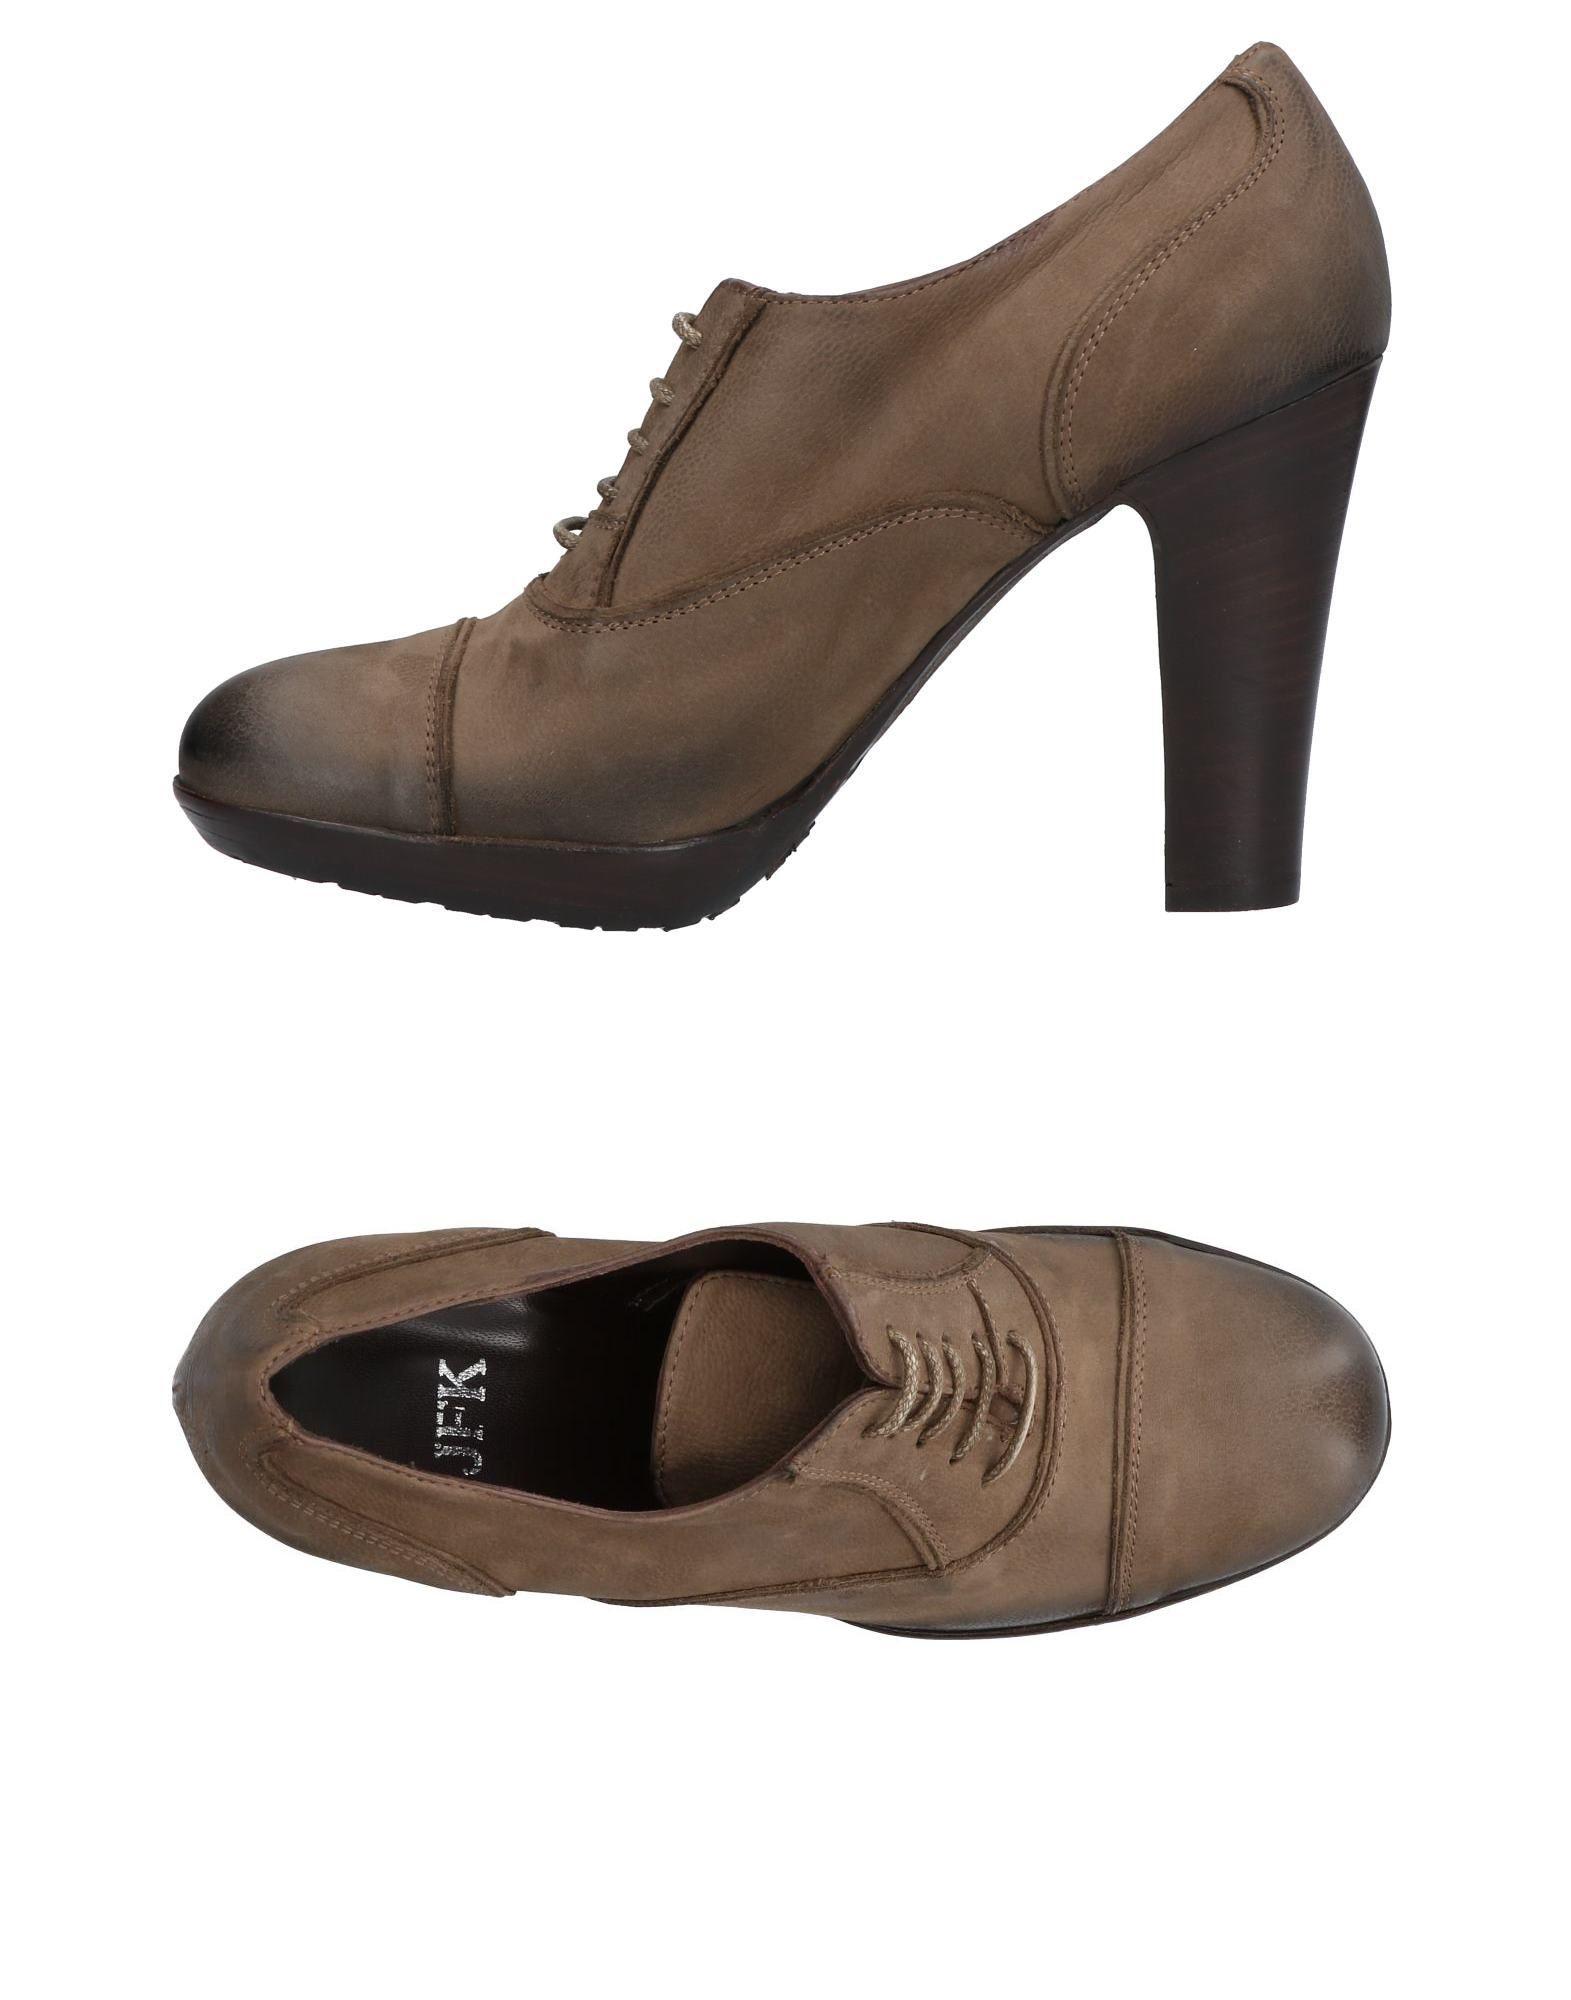 Jfk Schnürschuhe Damen  11431176LF Gute Qualität beliebte Schuhe